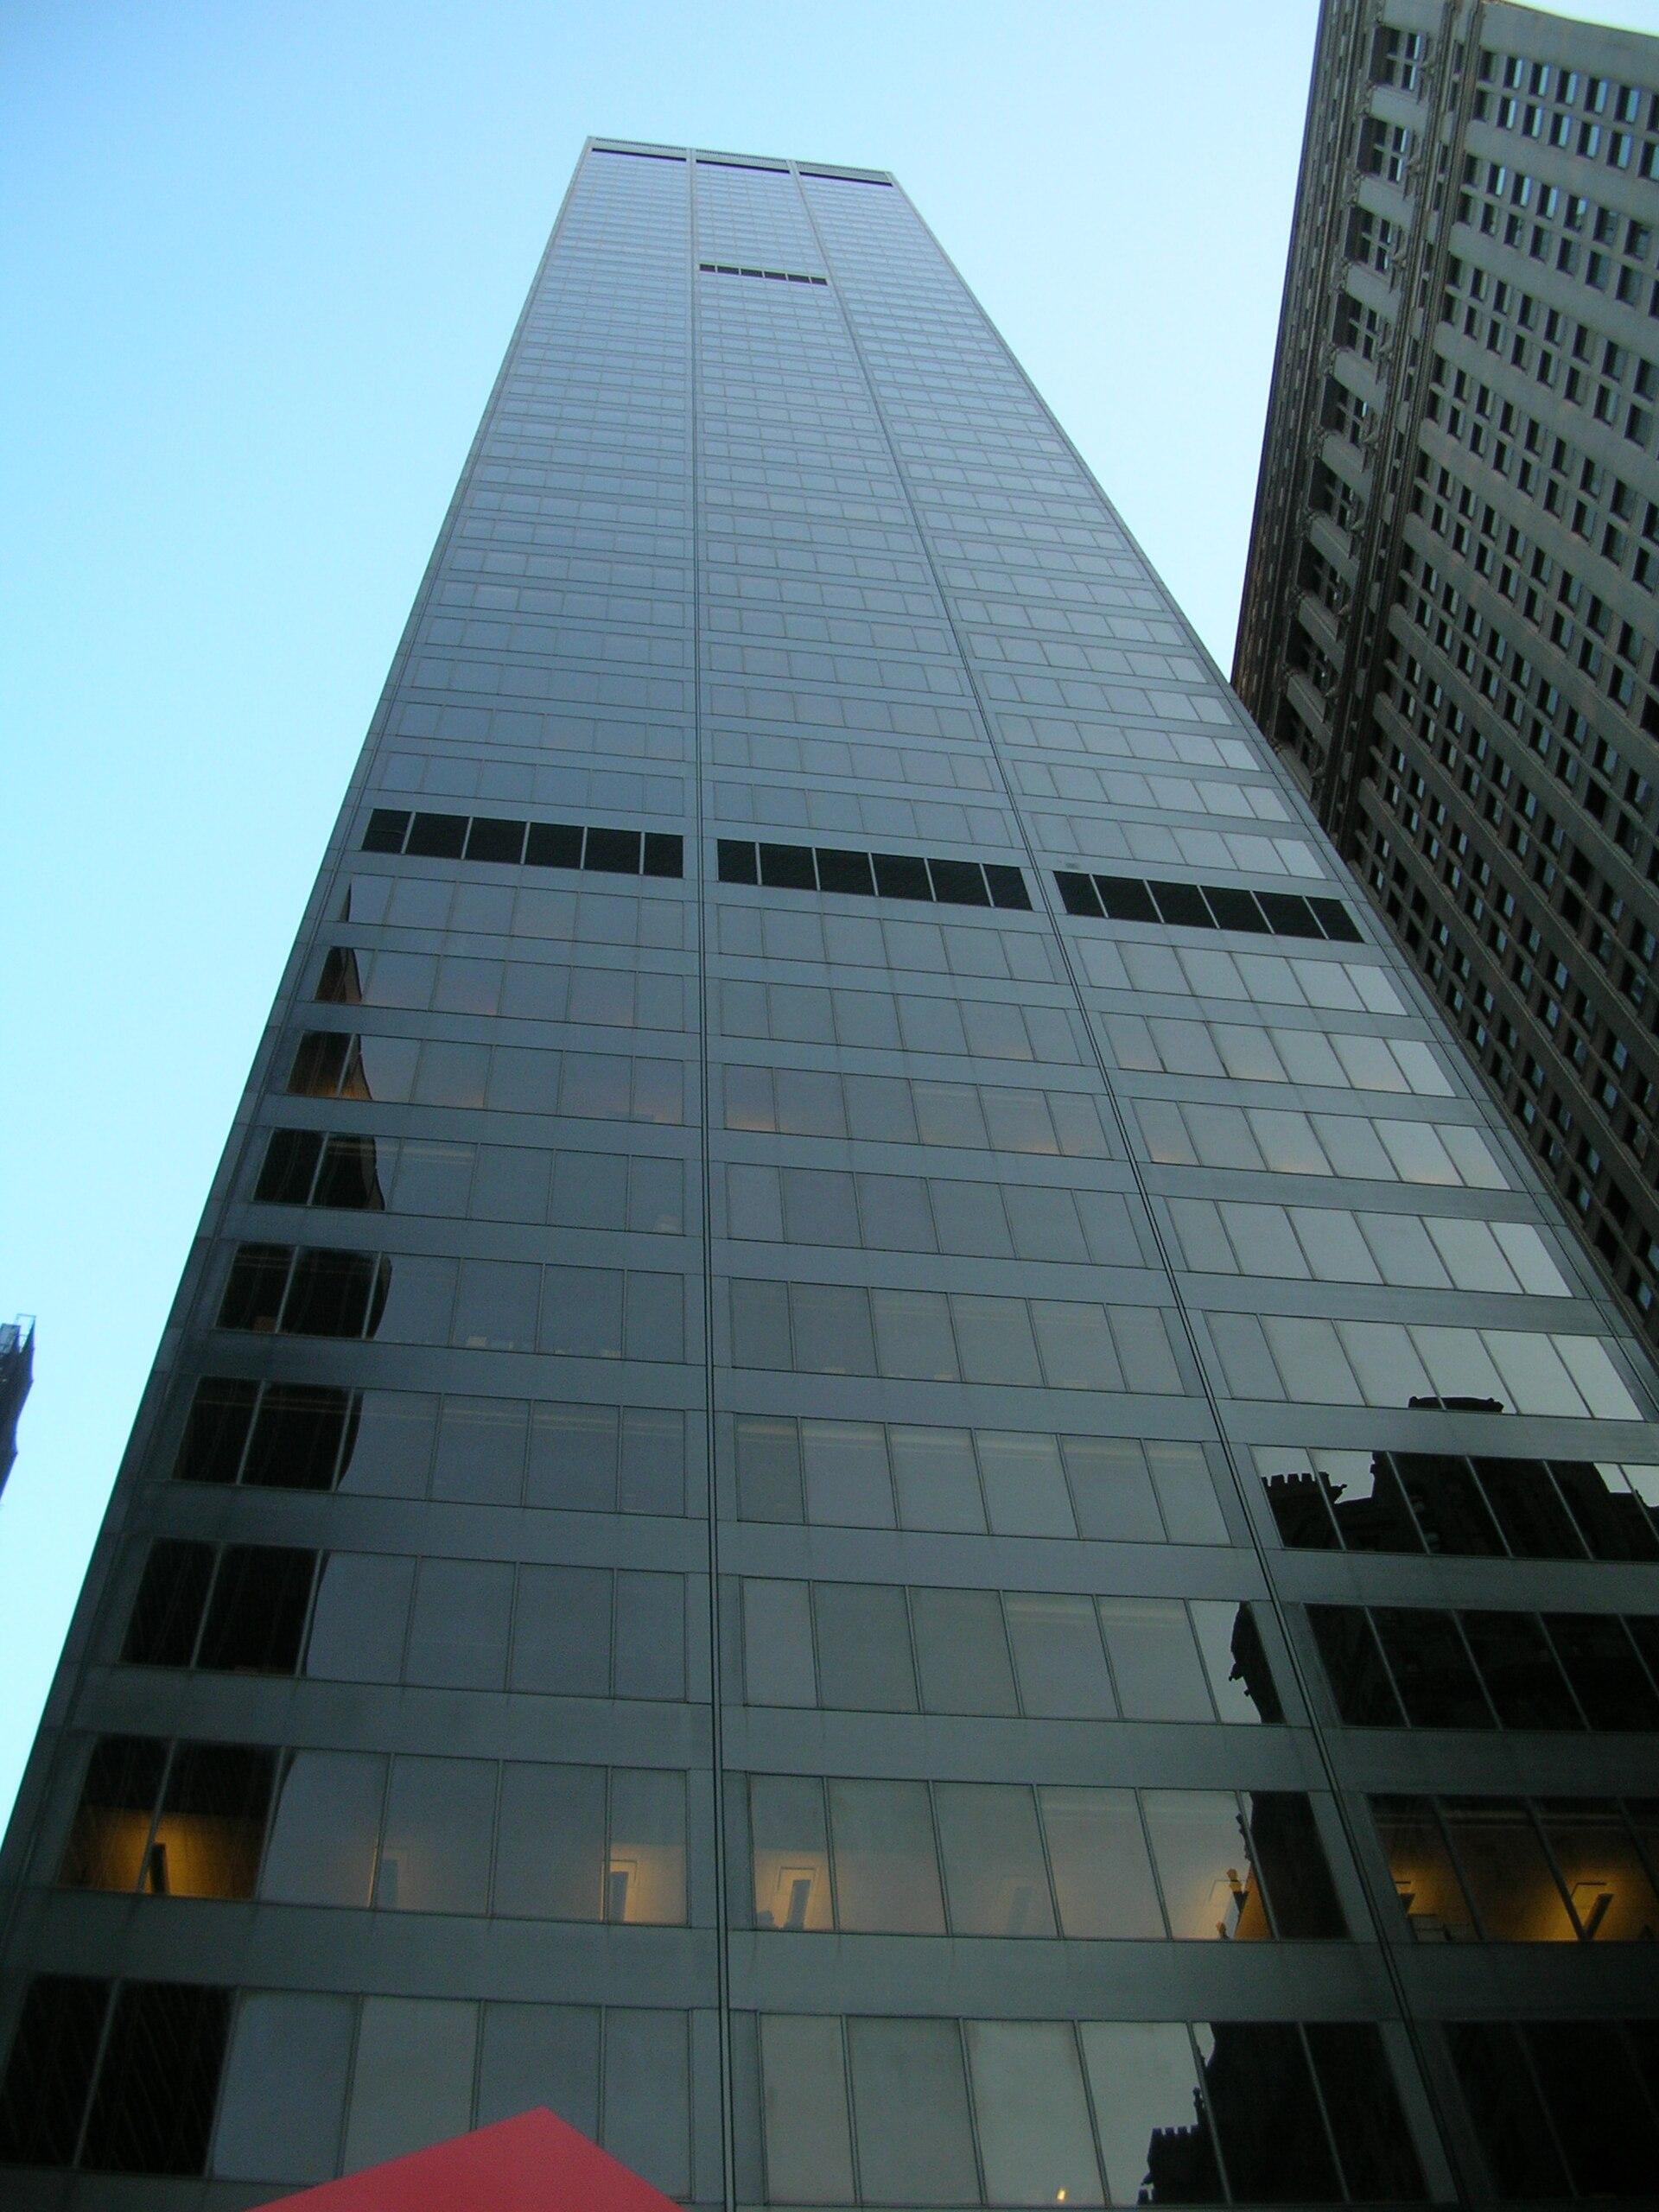 Marine midland building wikipedia for 1633 broadway 28th floor new york ny 10019